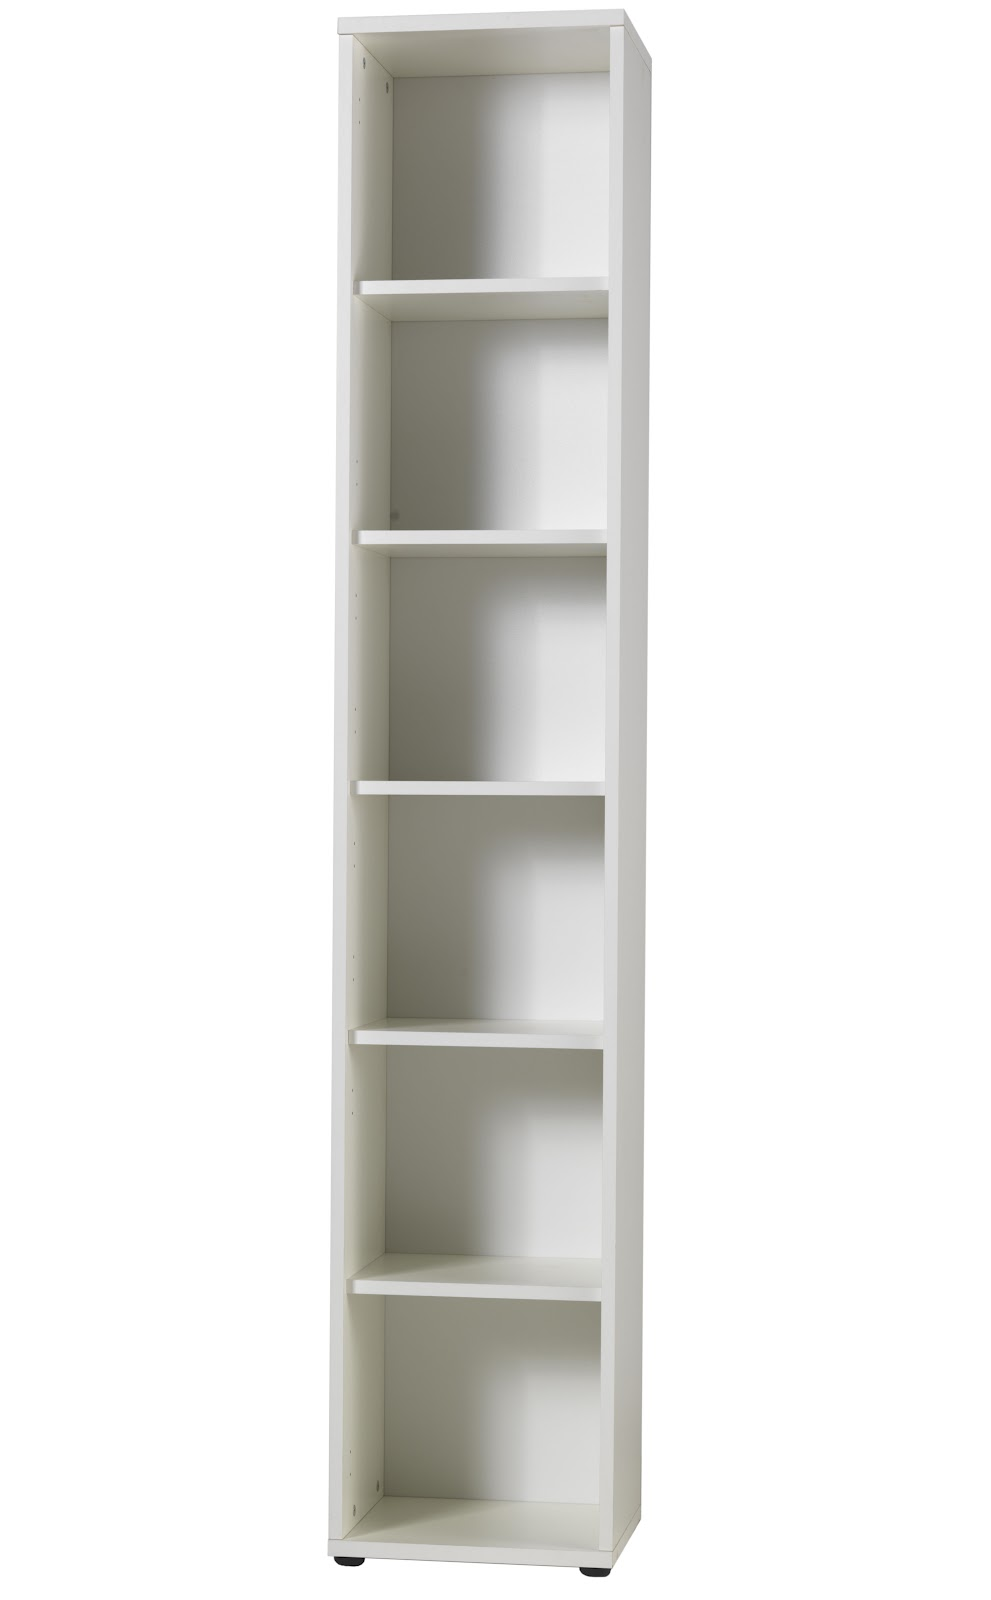 Five Shelf Narrow Bookcase H x 2167mm, D x 362mm, W x 400mm. Hard wearing  melamine. Code: 71400451